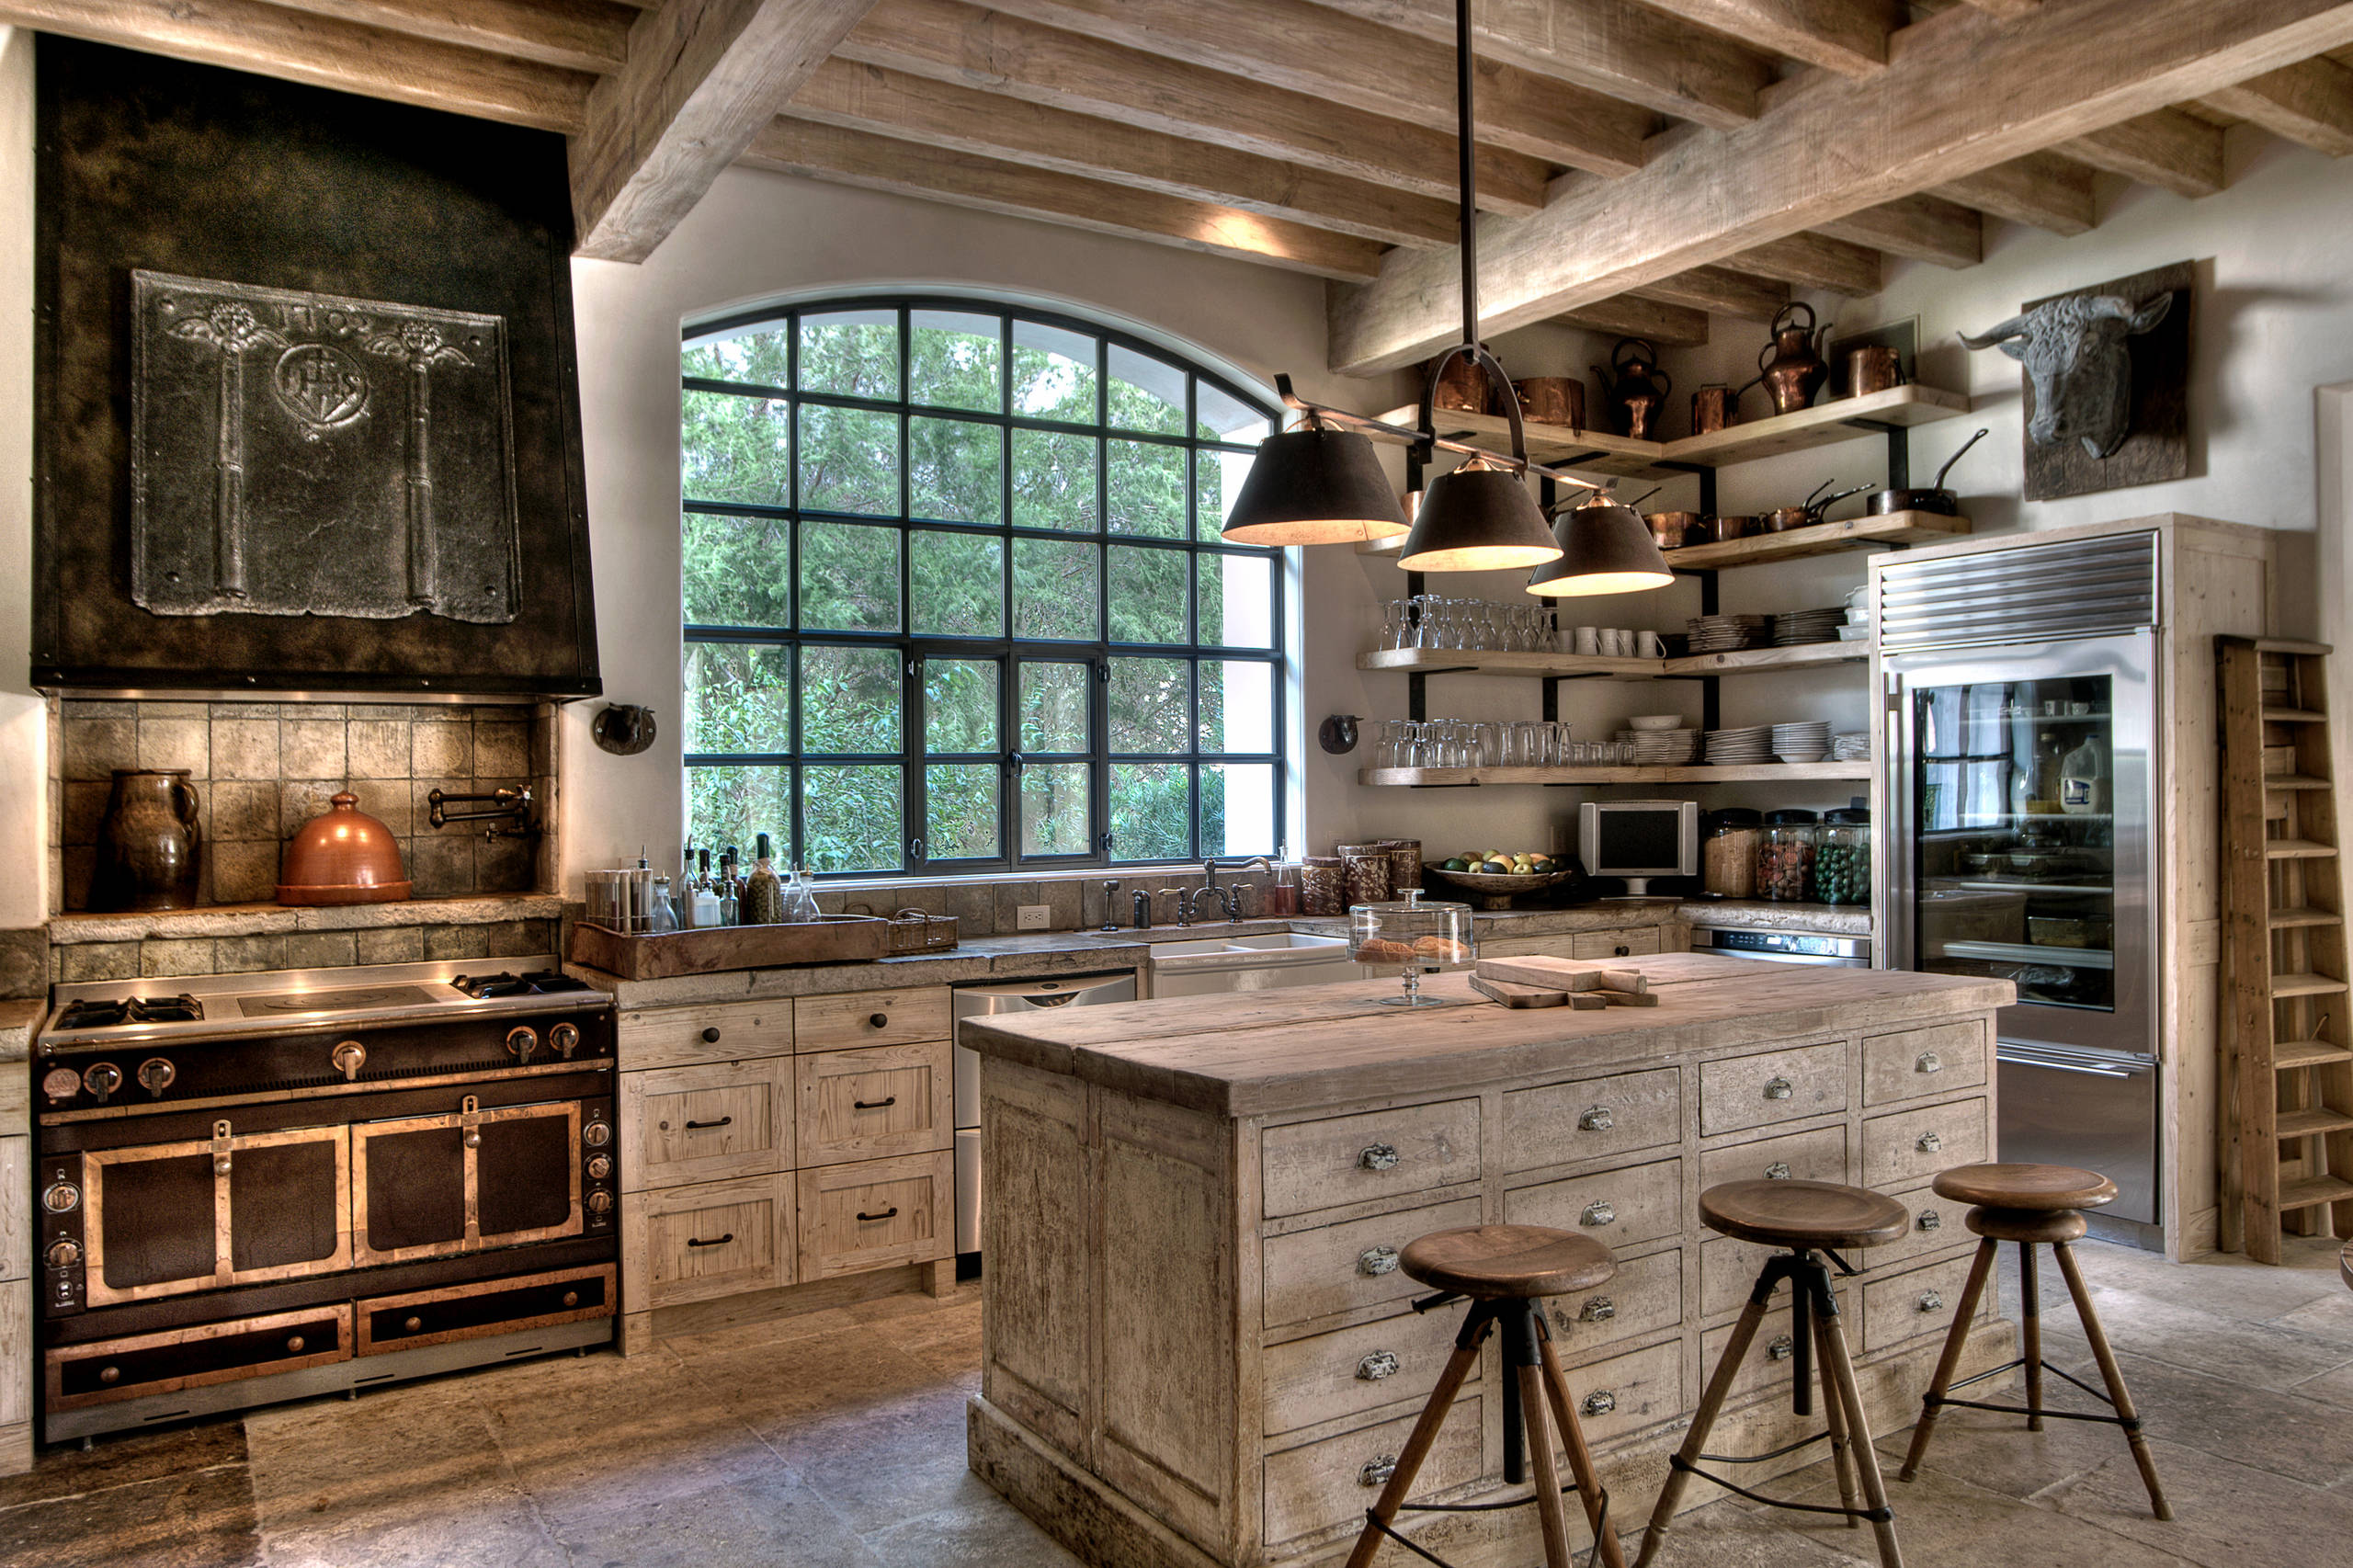 16 Charming Mediterranean Kitchen Designs That Will Mesmerize You